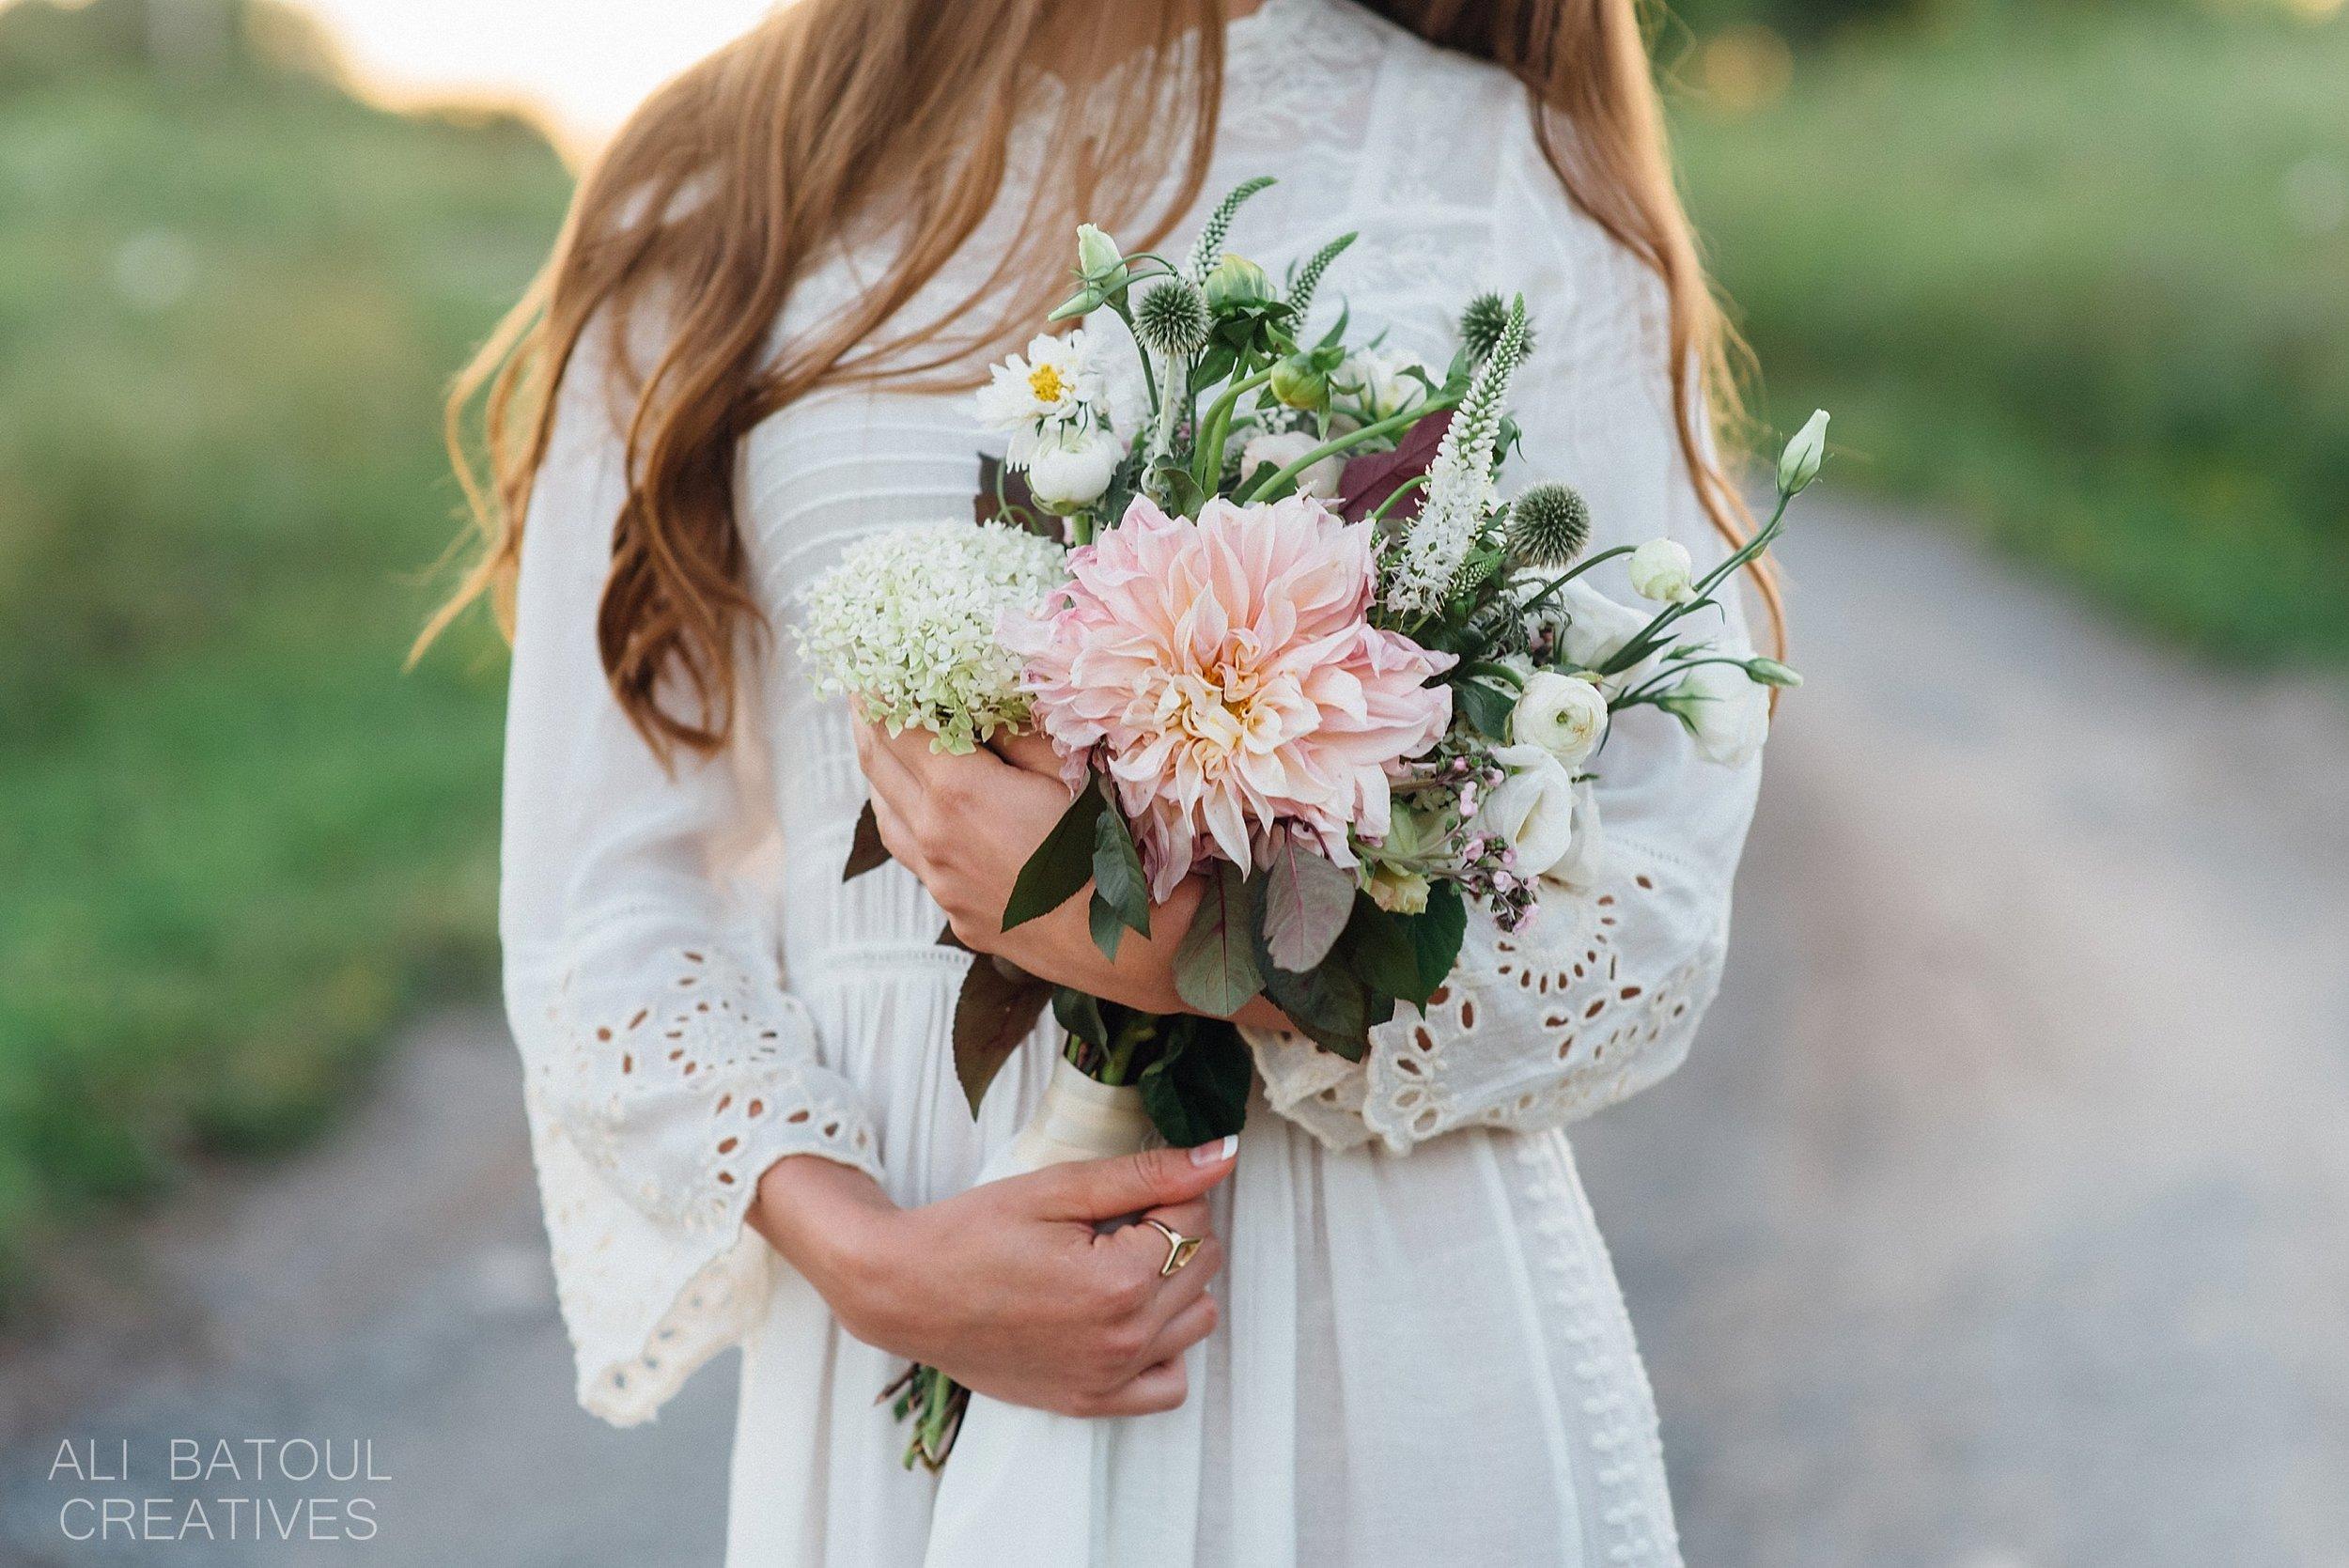 Boho Bridal Ottawa - Ali Batoul Creatives Fine Art Wedding Photography_0379.jpg